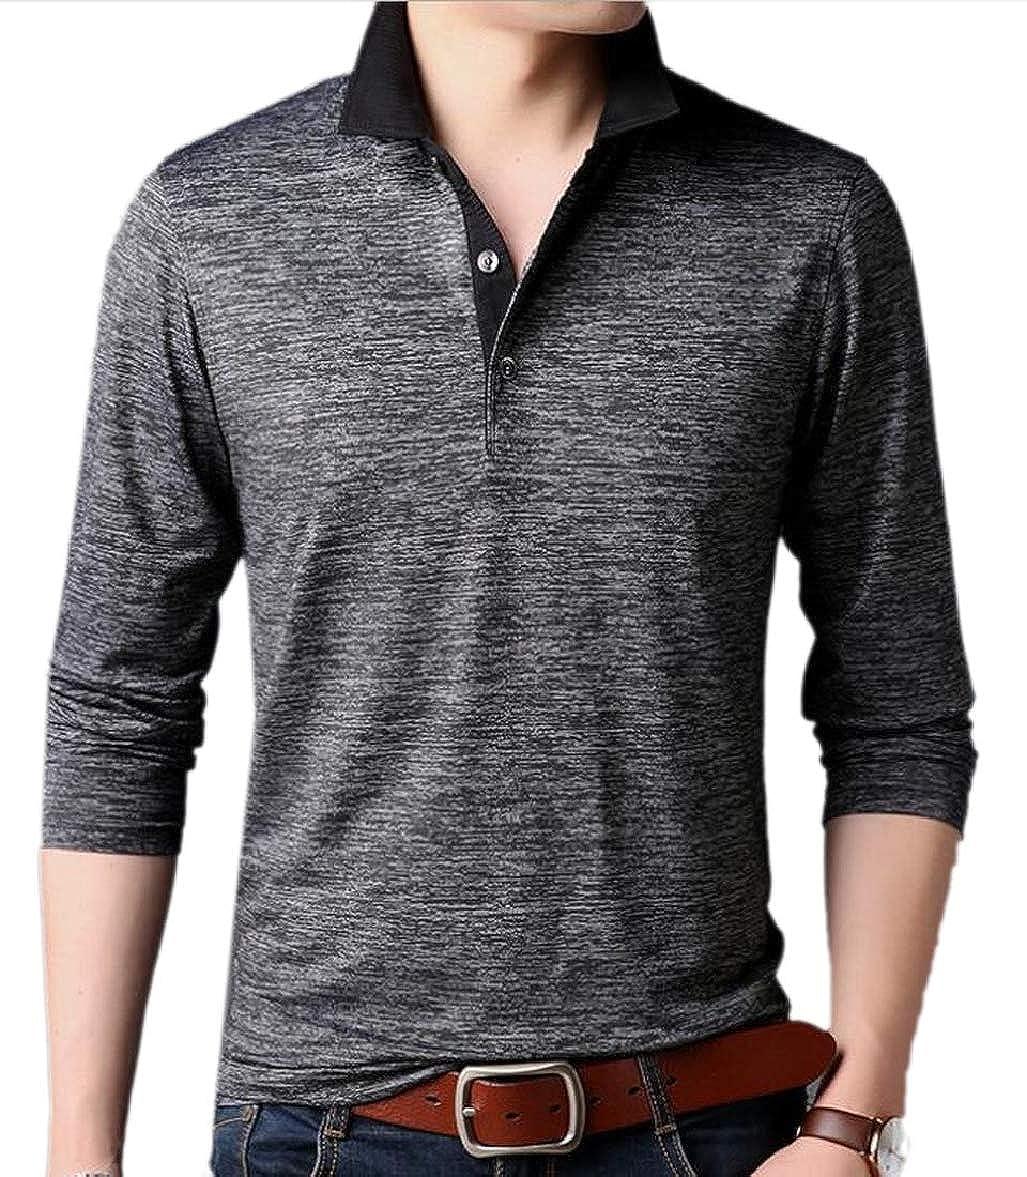 RRINSINS Mens Turn Down Collar Business Long Sleeve Shirts Polo T Shirt